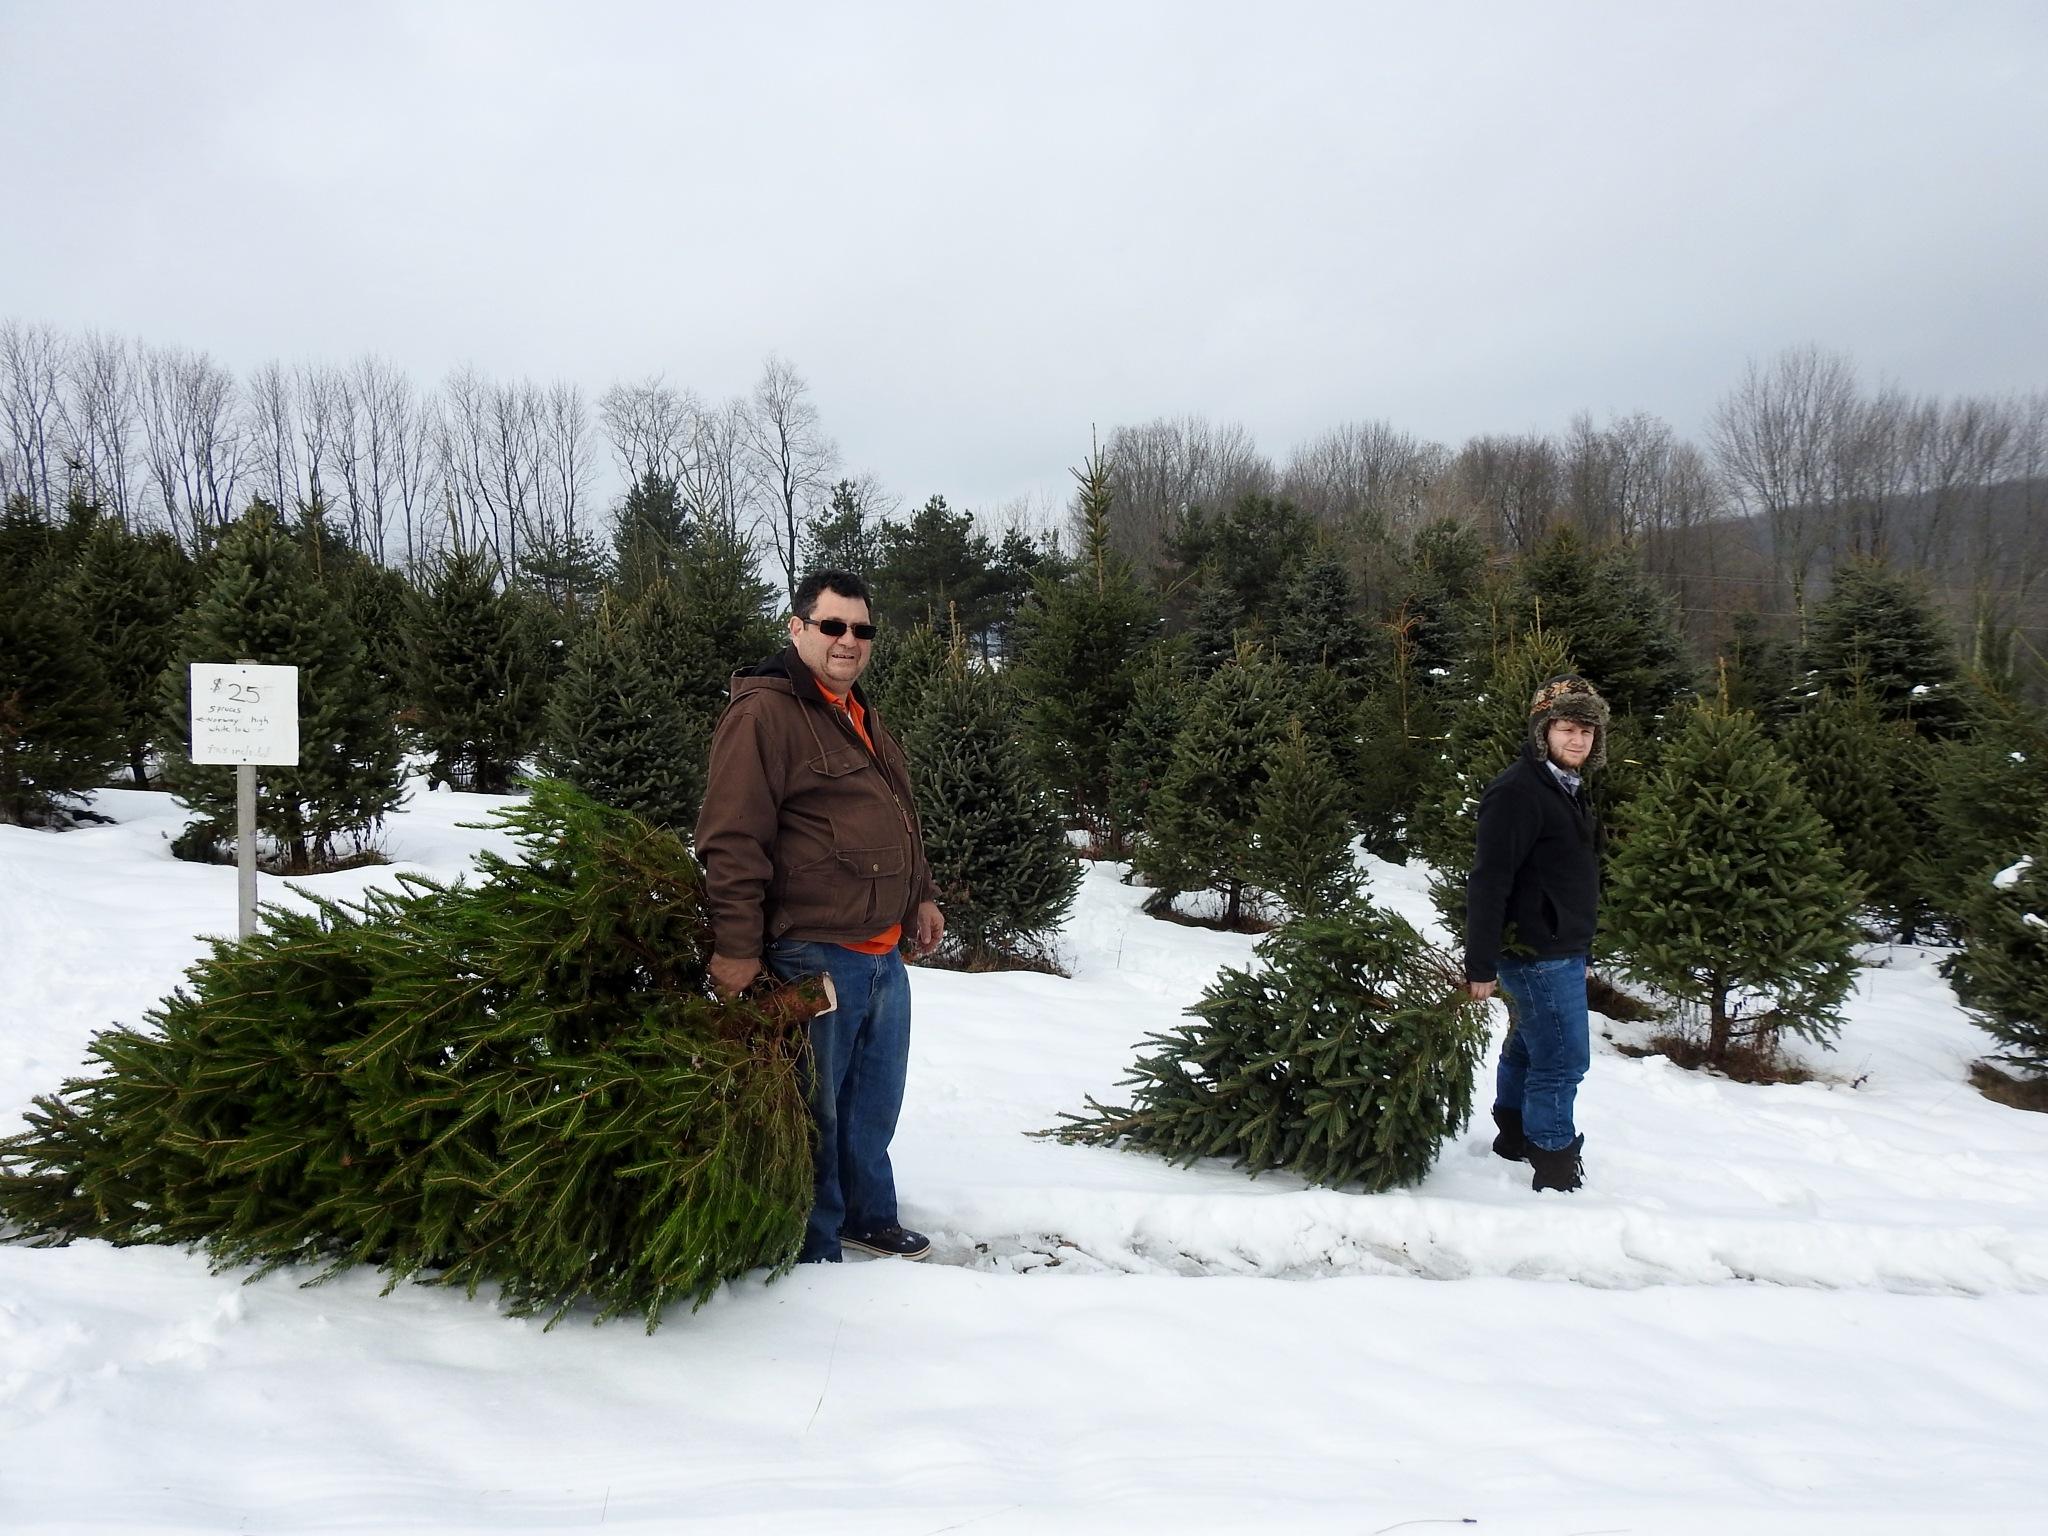 Bringing home the tree by carol.capozzi.18